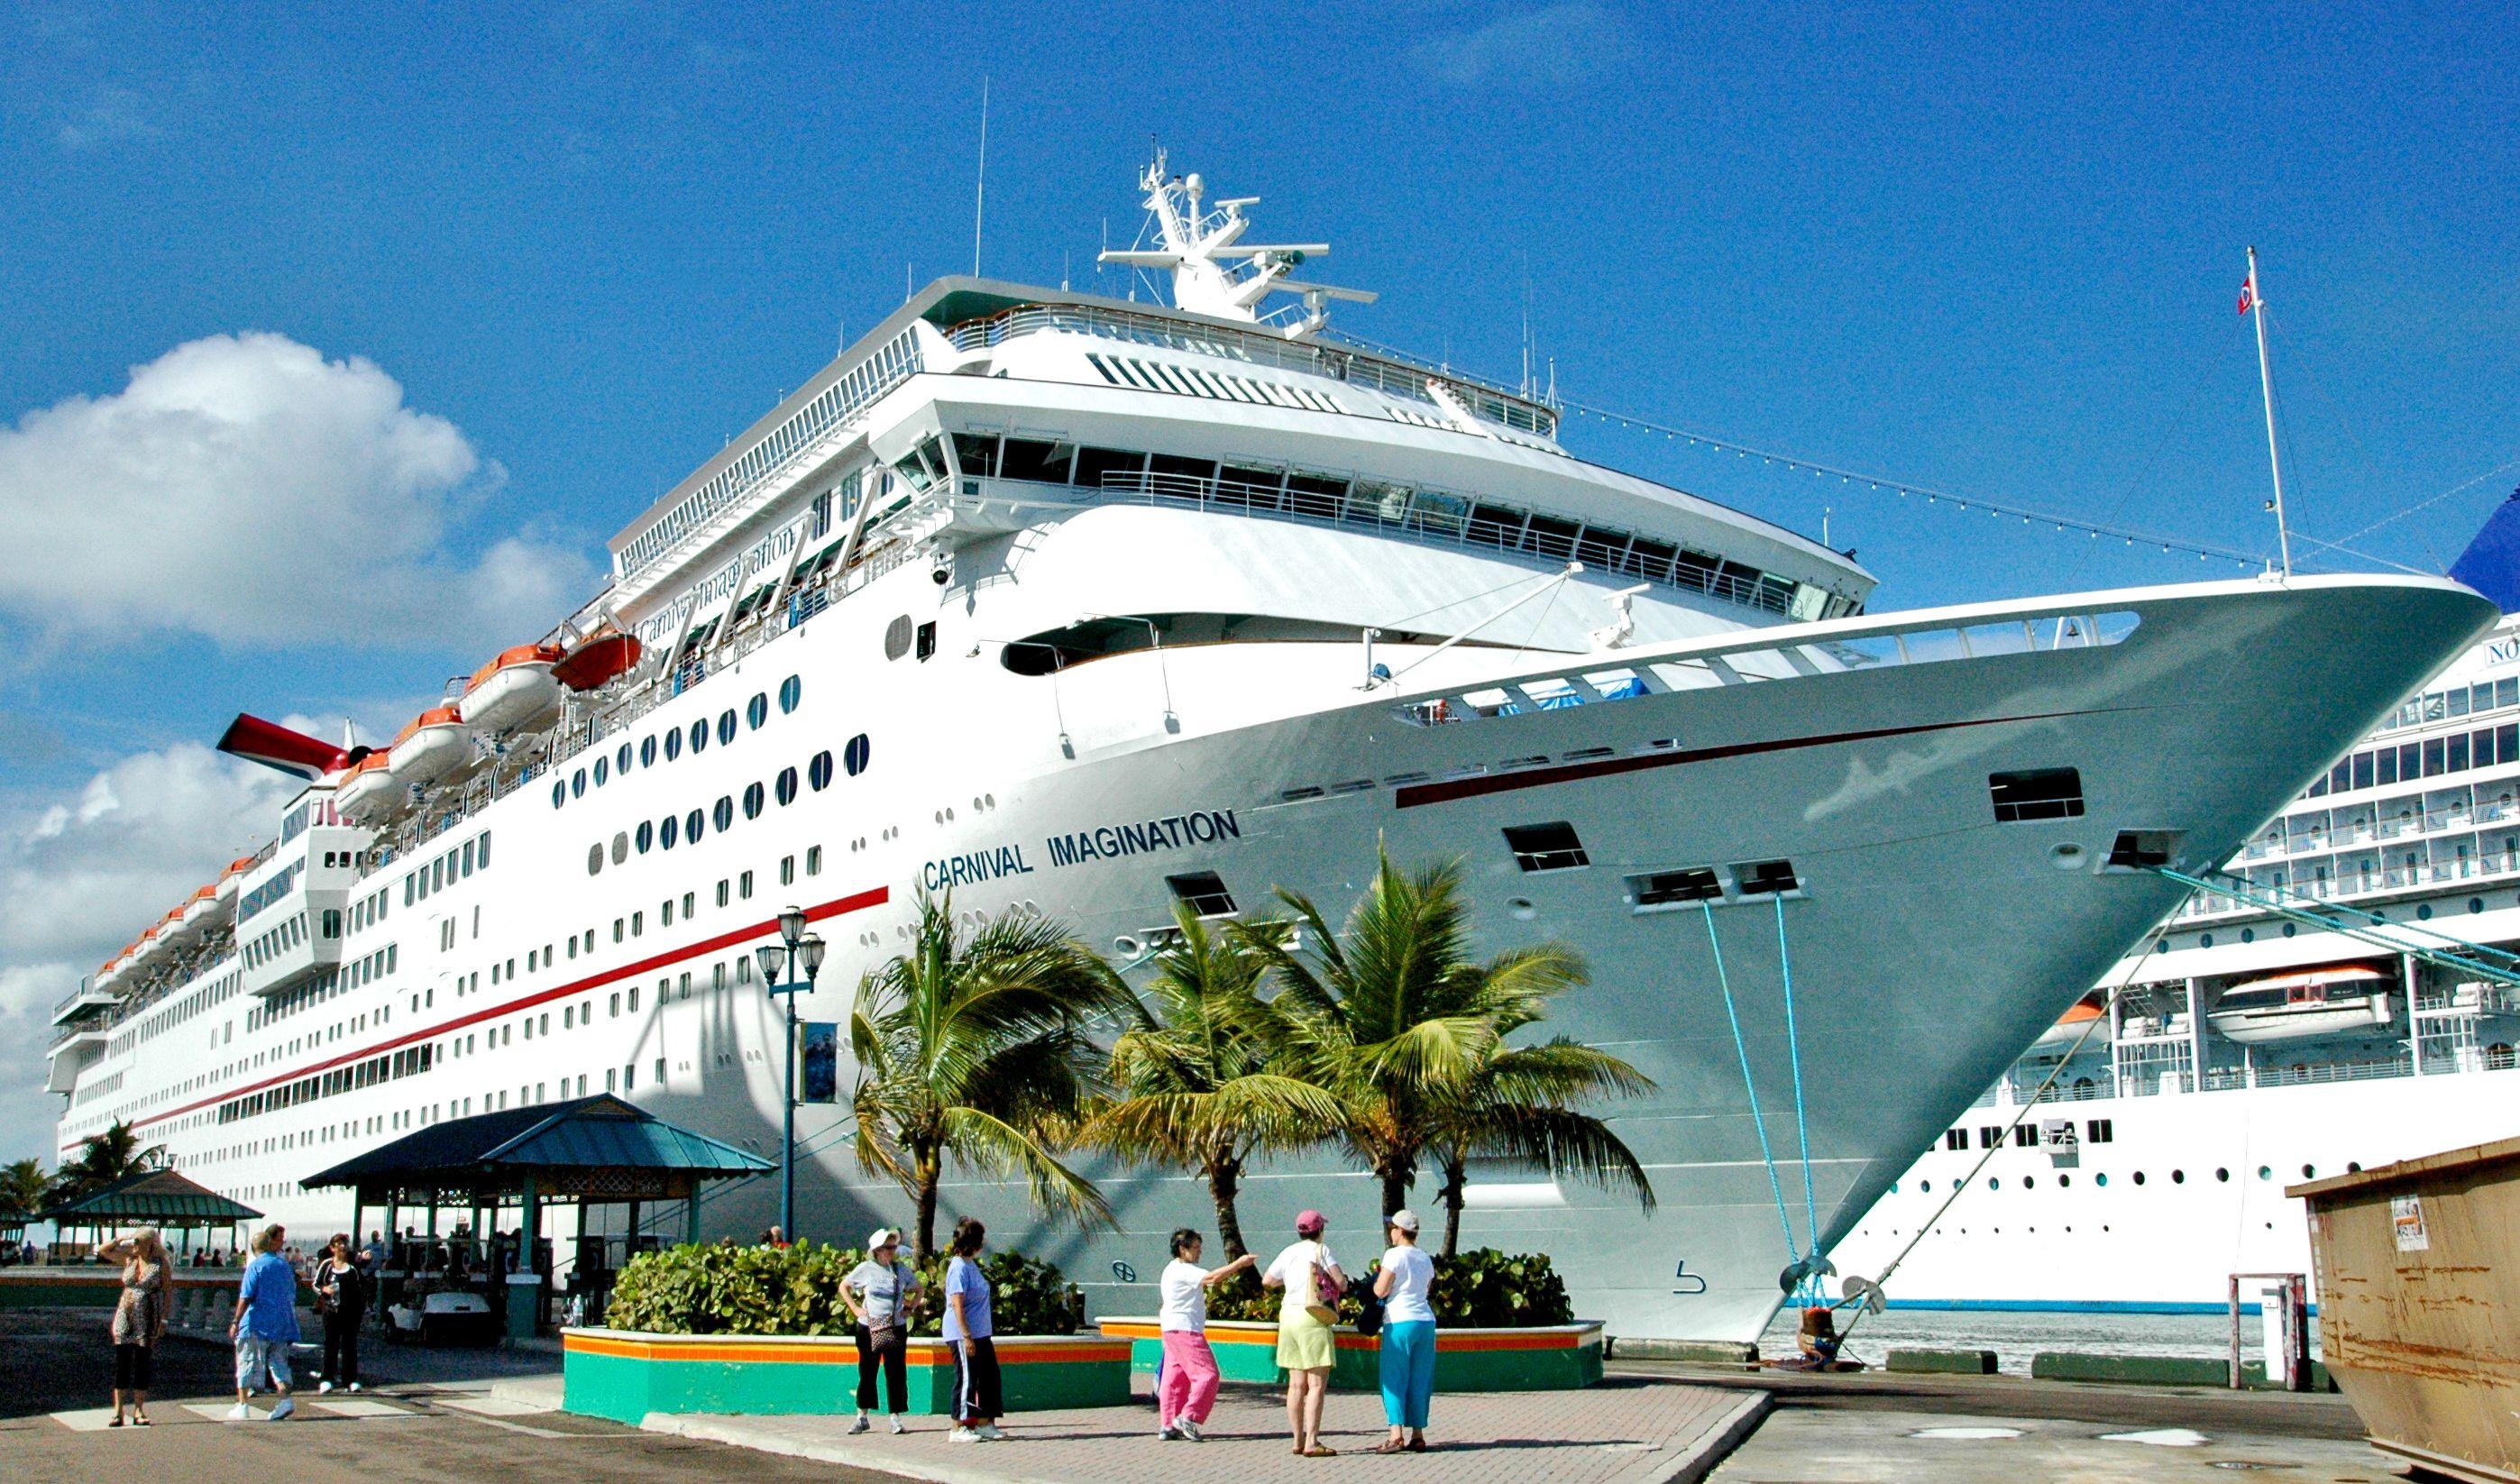 Carnival Imagination at Nassau